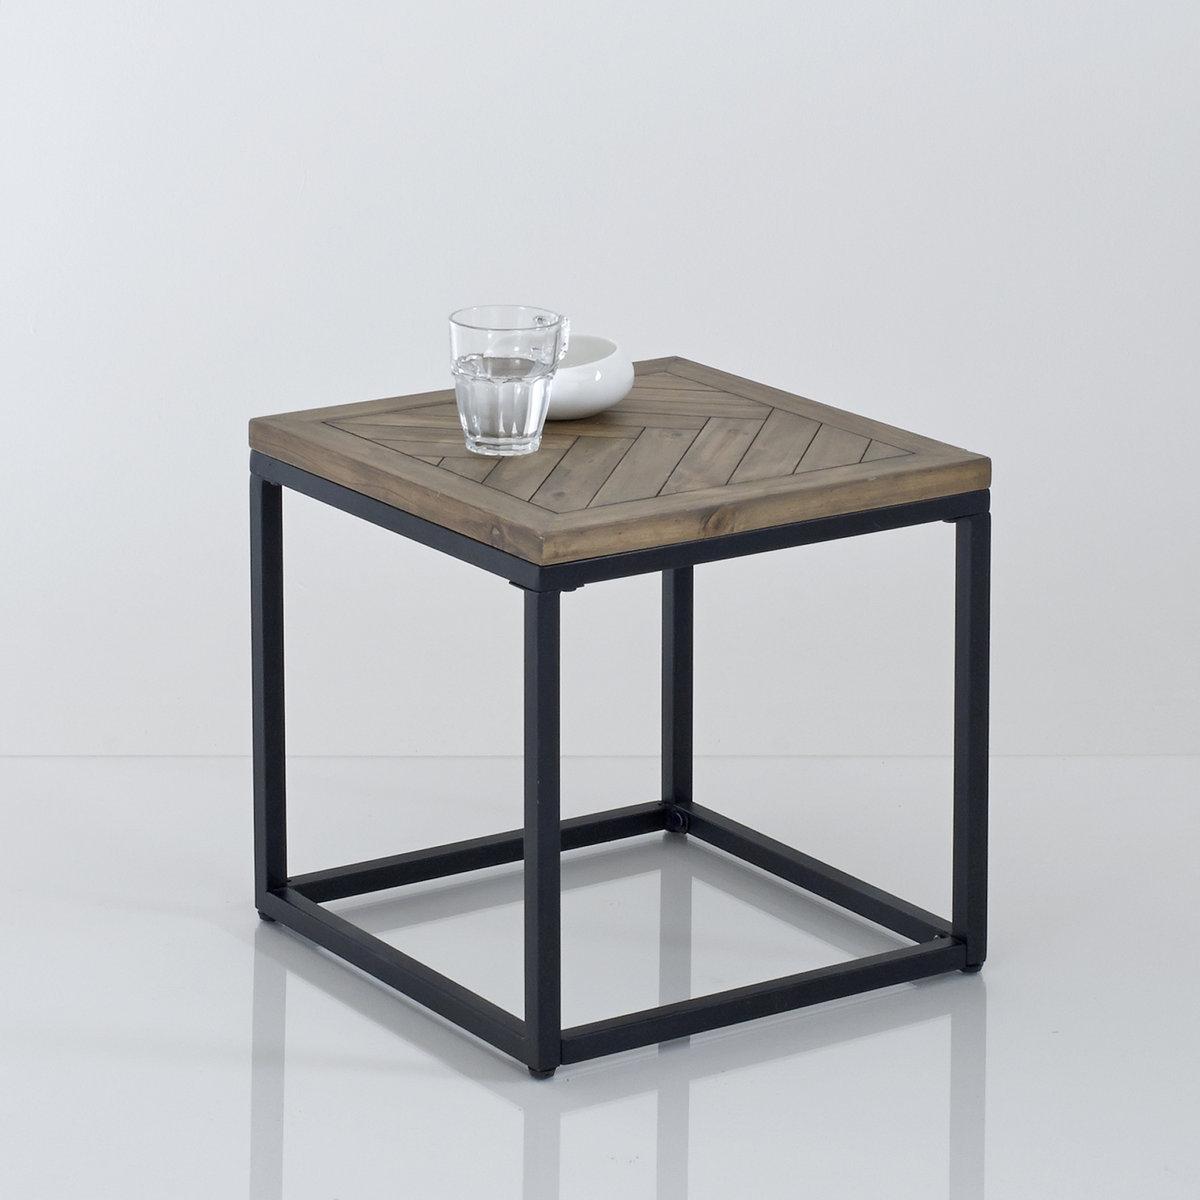 Столик из металла и дерева, В.40 см, Nottingham столик из металла и дерева h высота 60 см nottingham